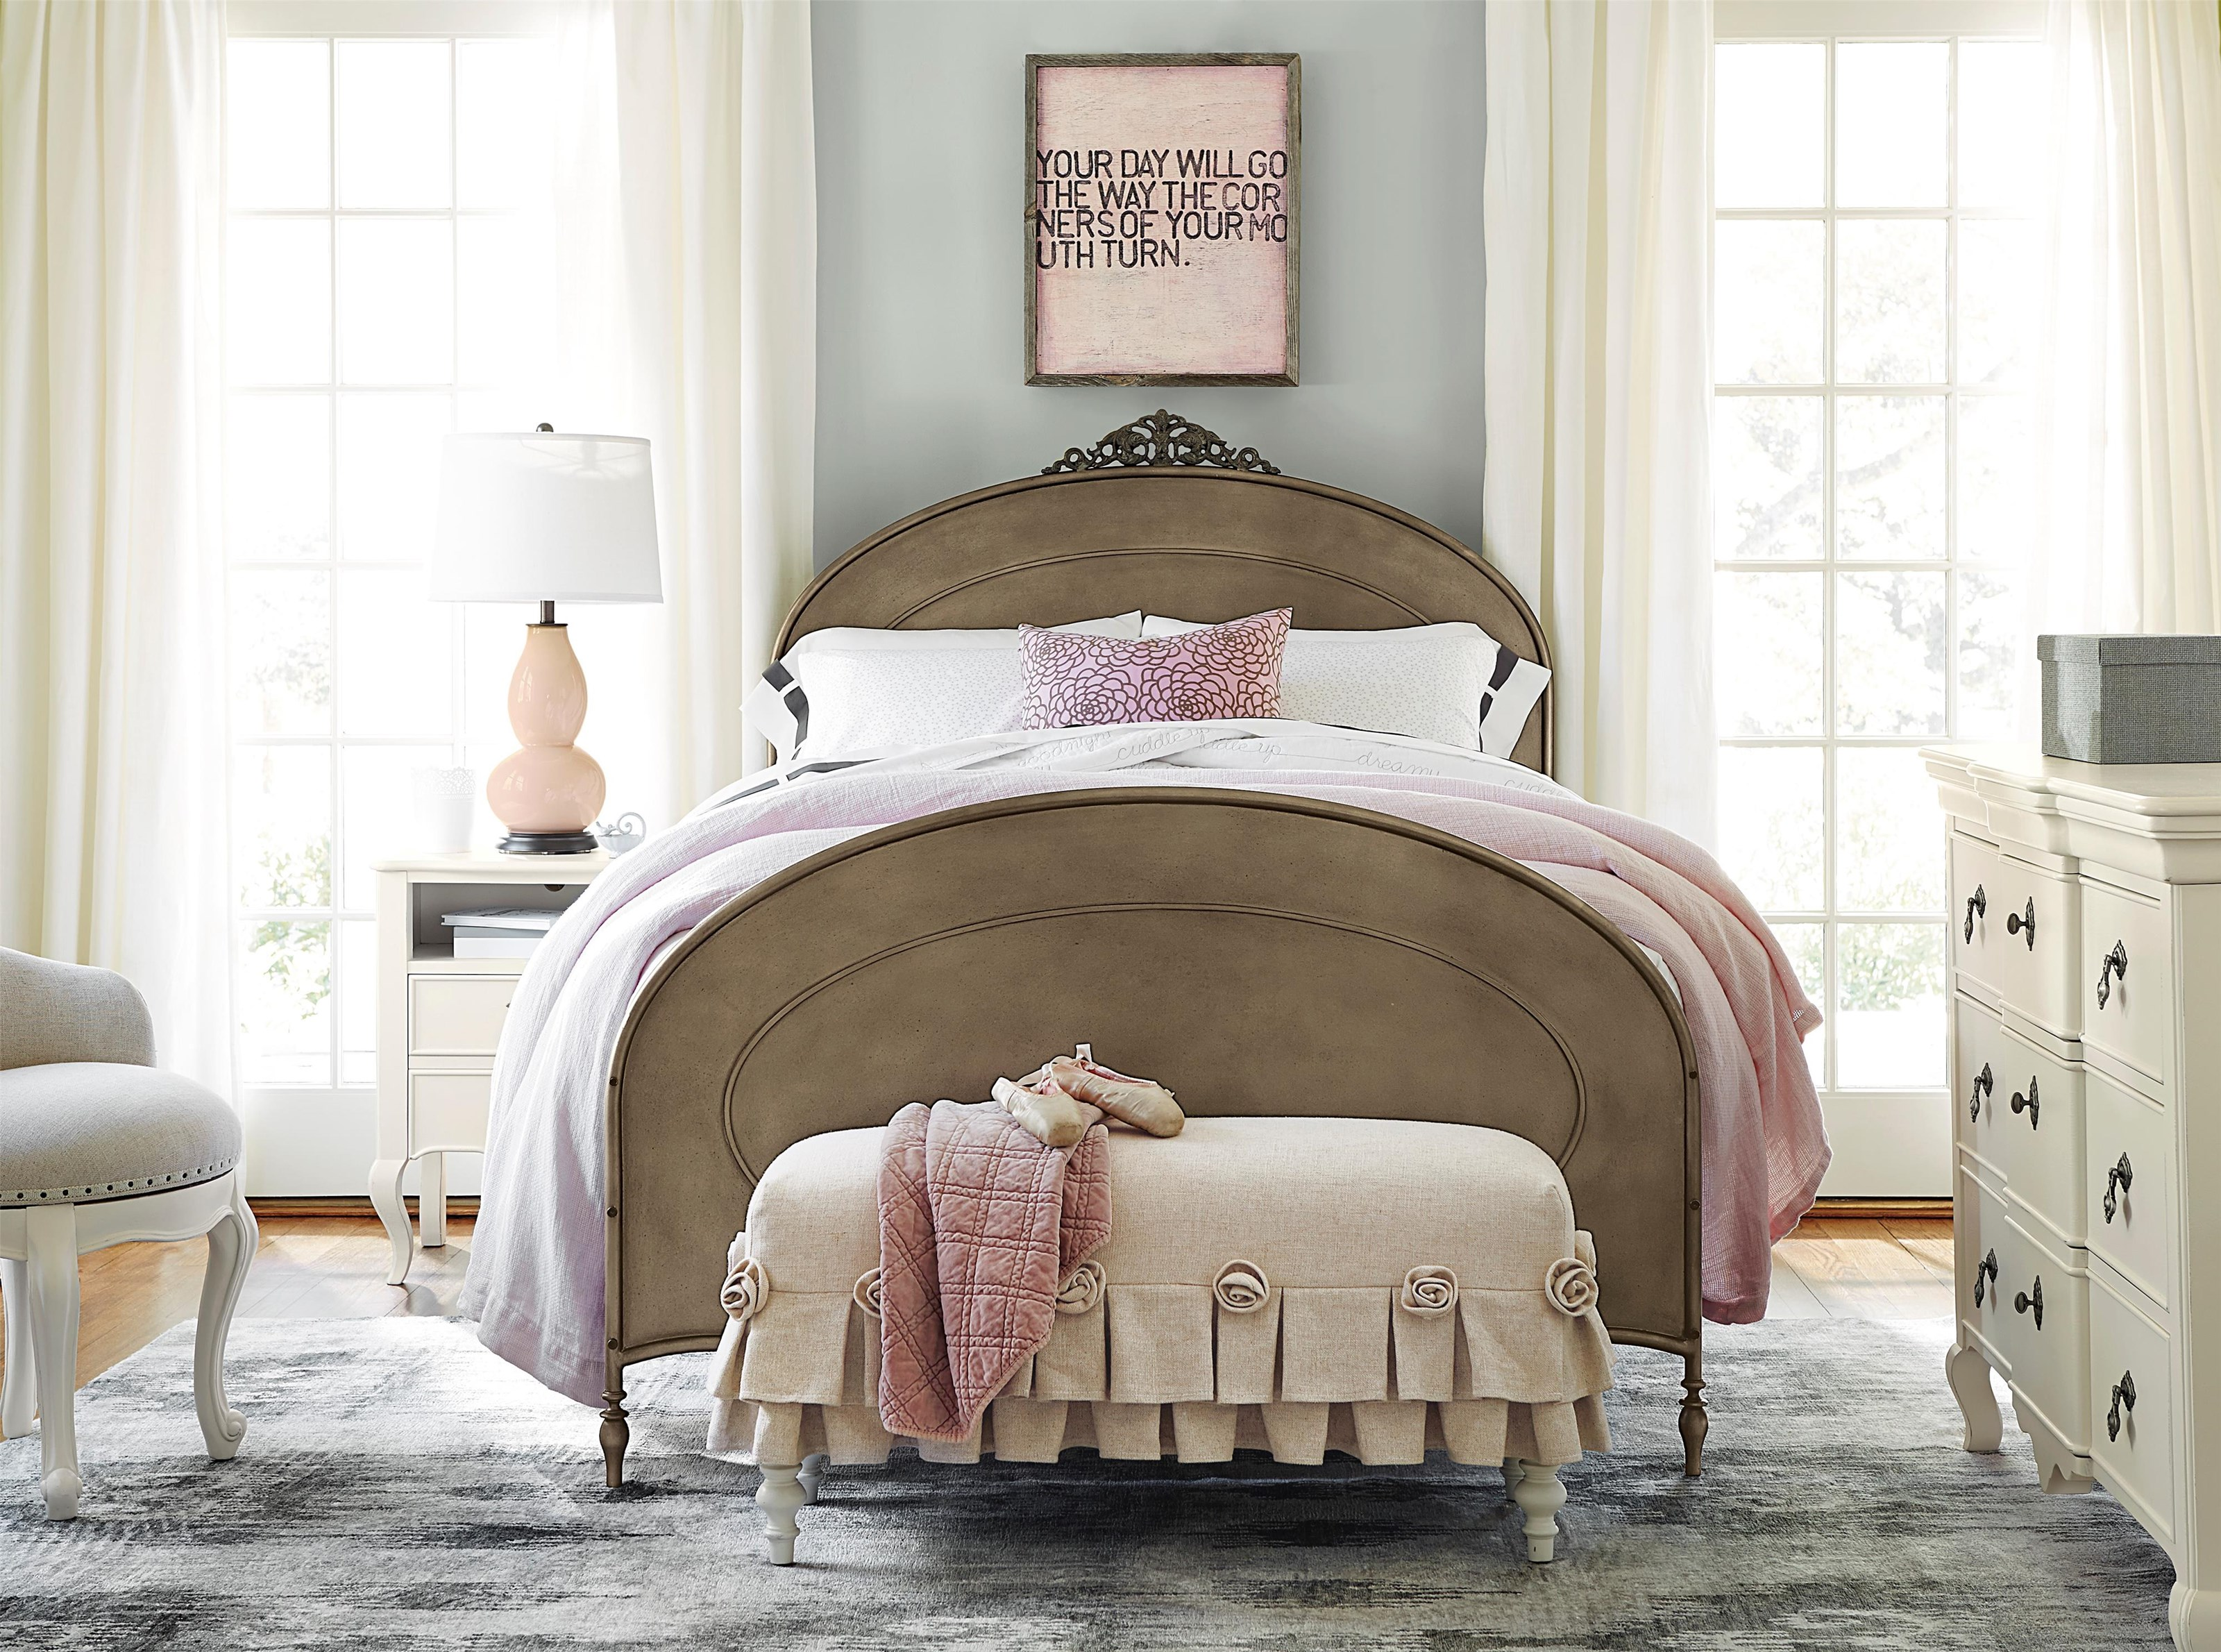 Morris Home Penelope Penelope Full Bed - Item Number: 837052306